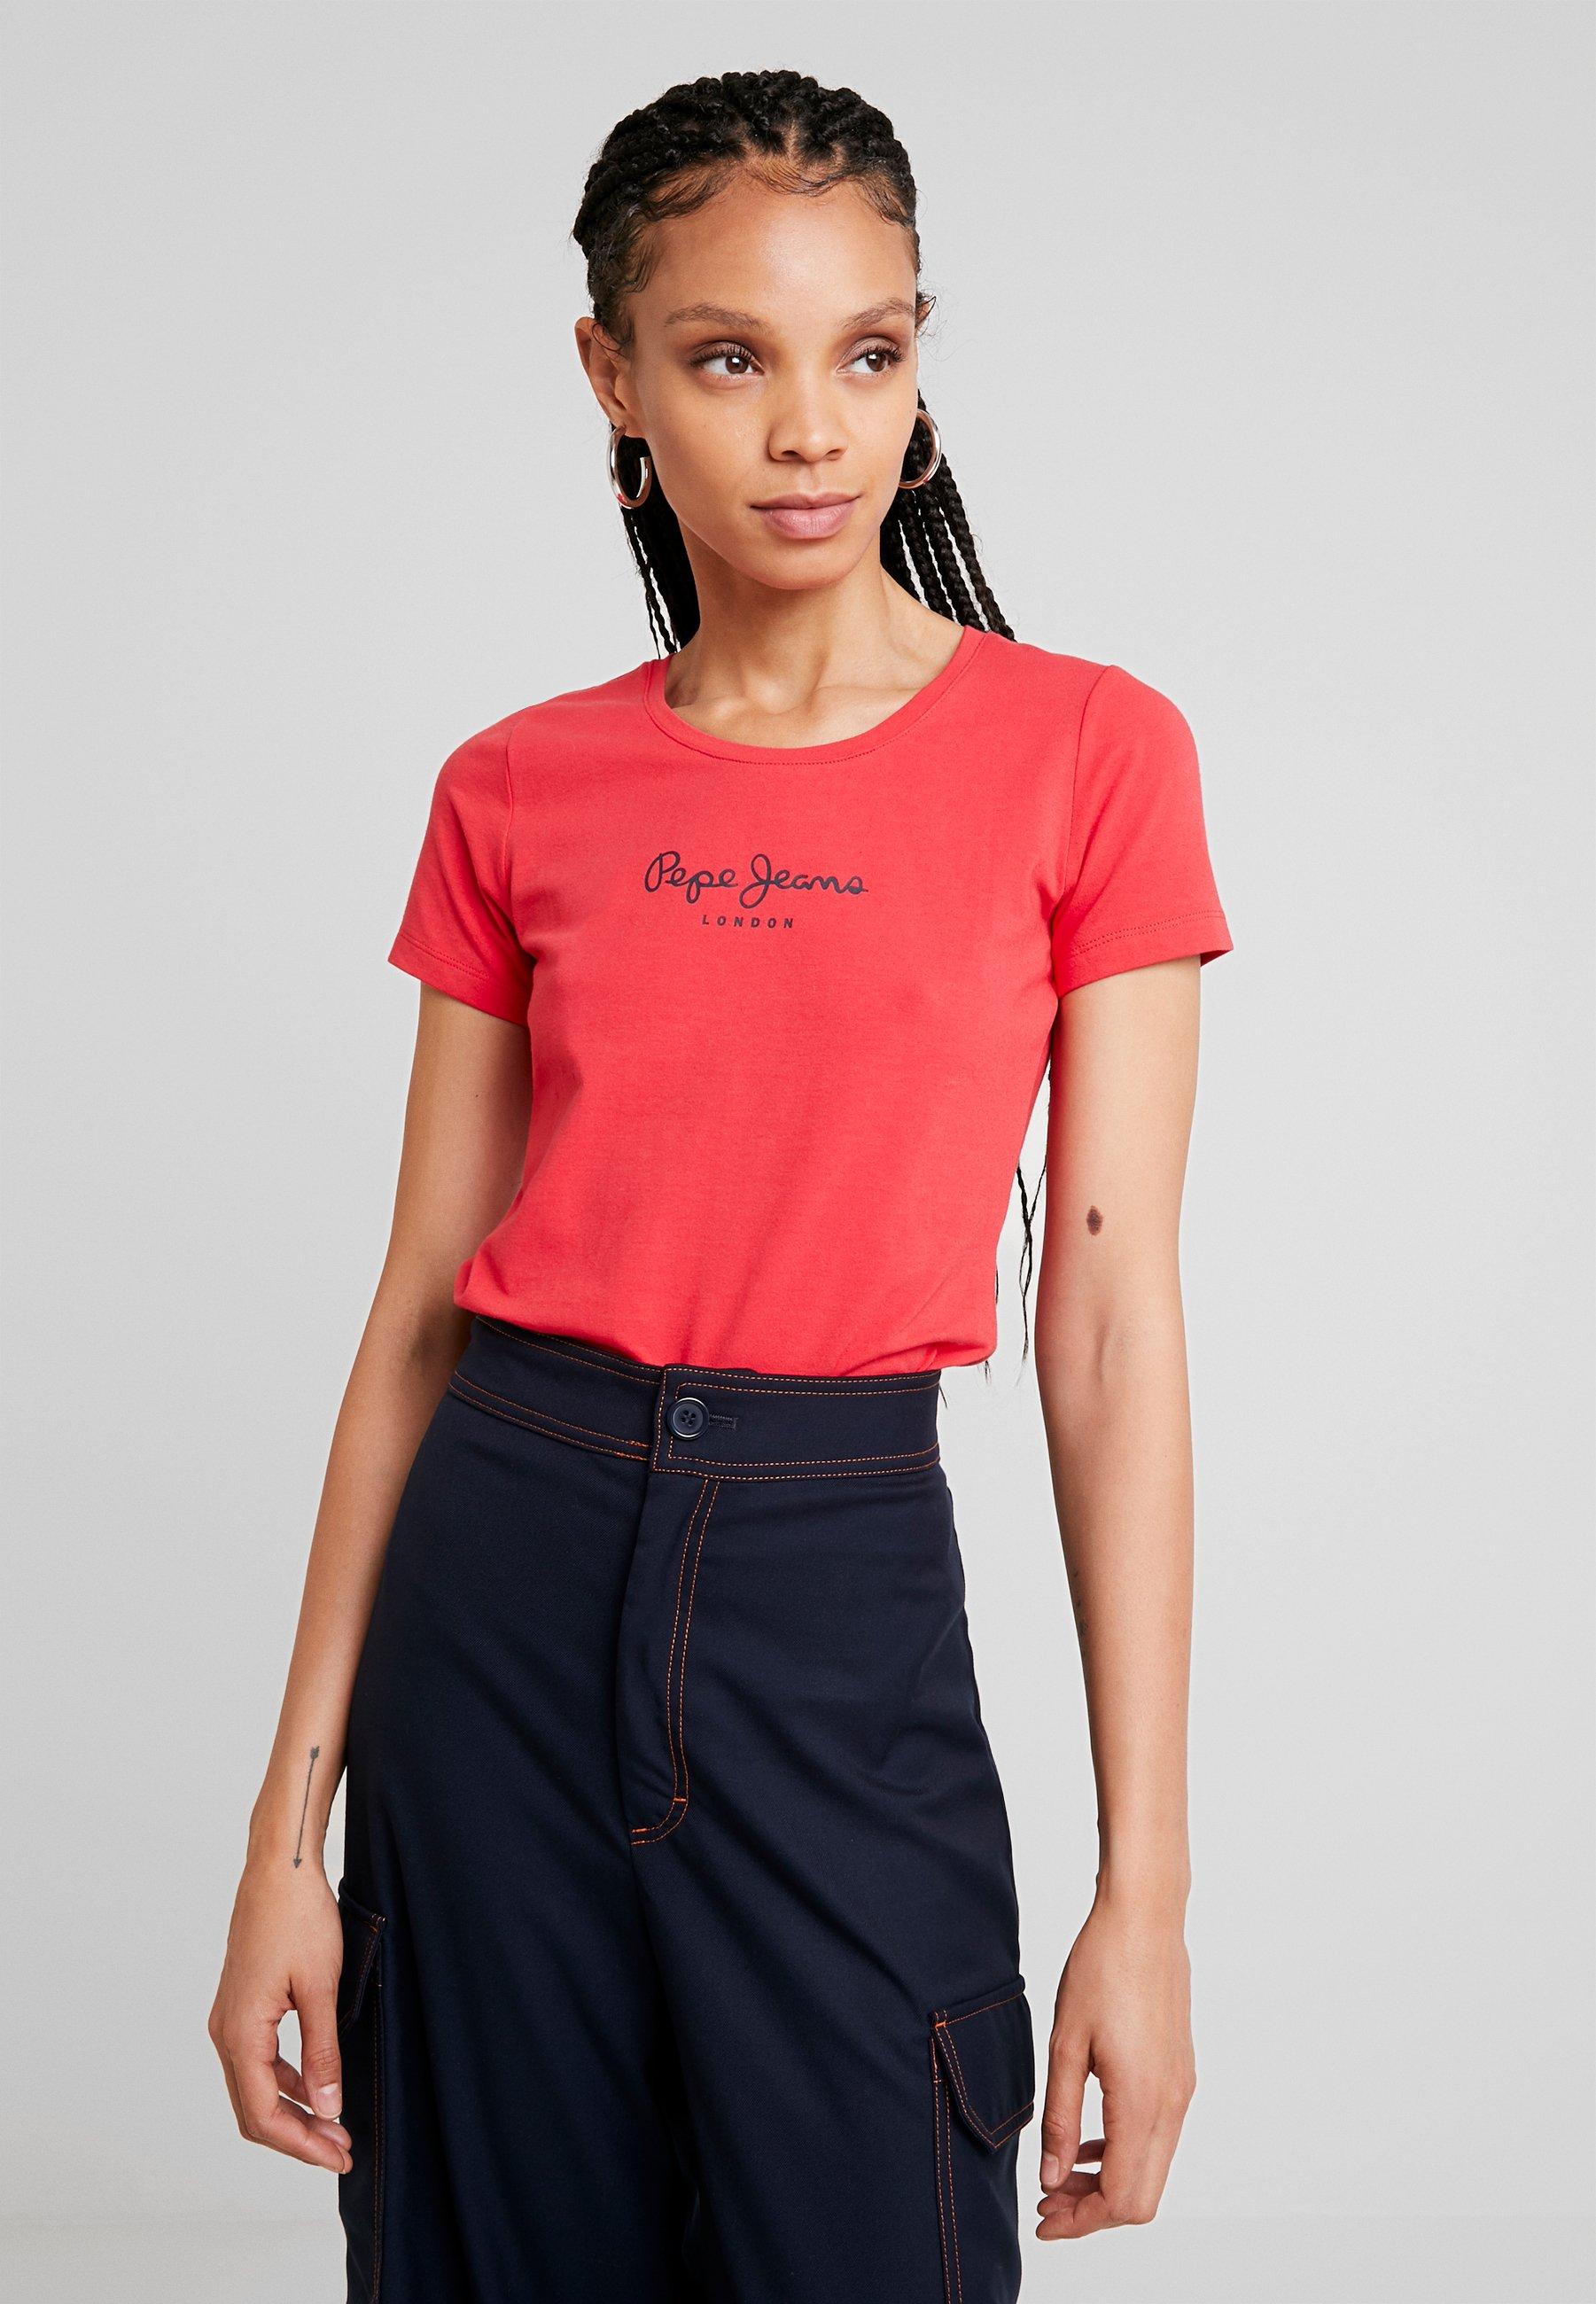 shirt Red Jeans Virginia NewT Lipstick Imprimé Pepe Aq345RLj